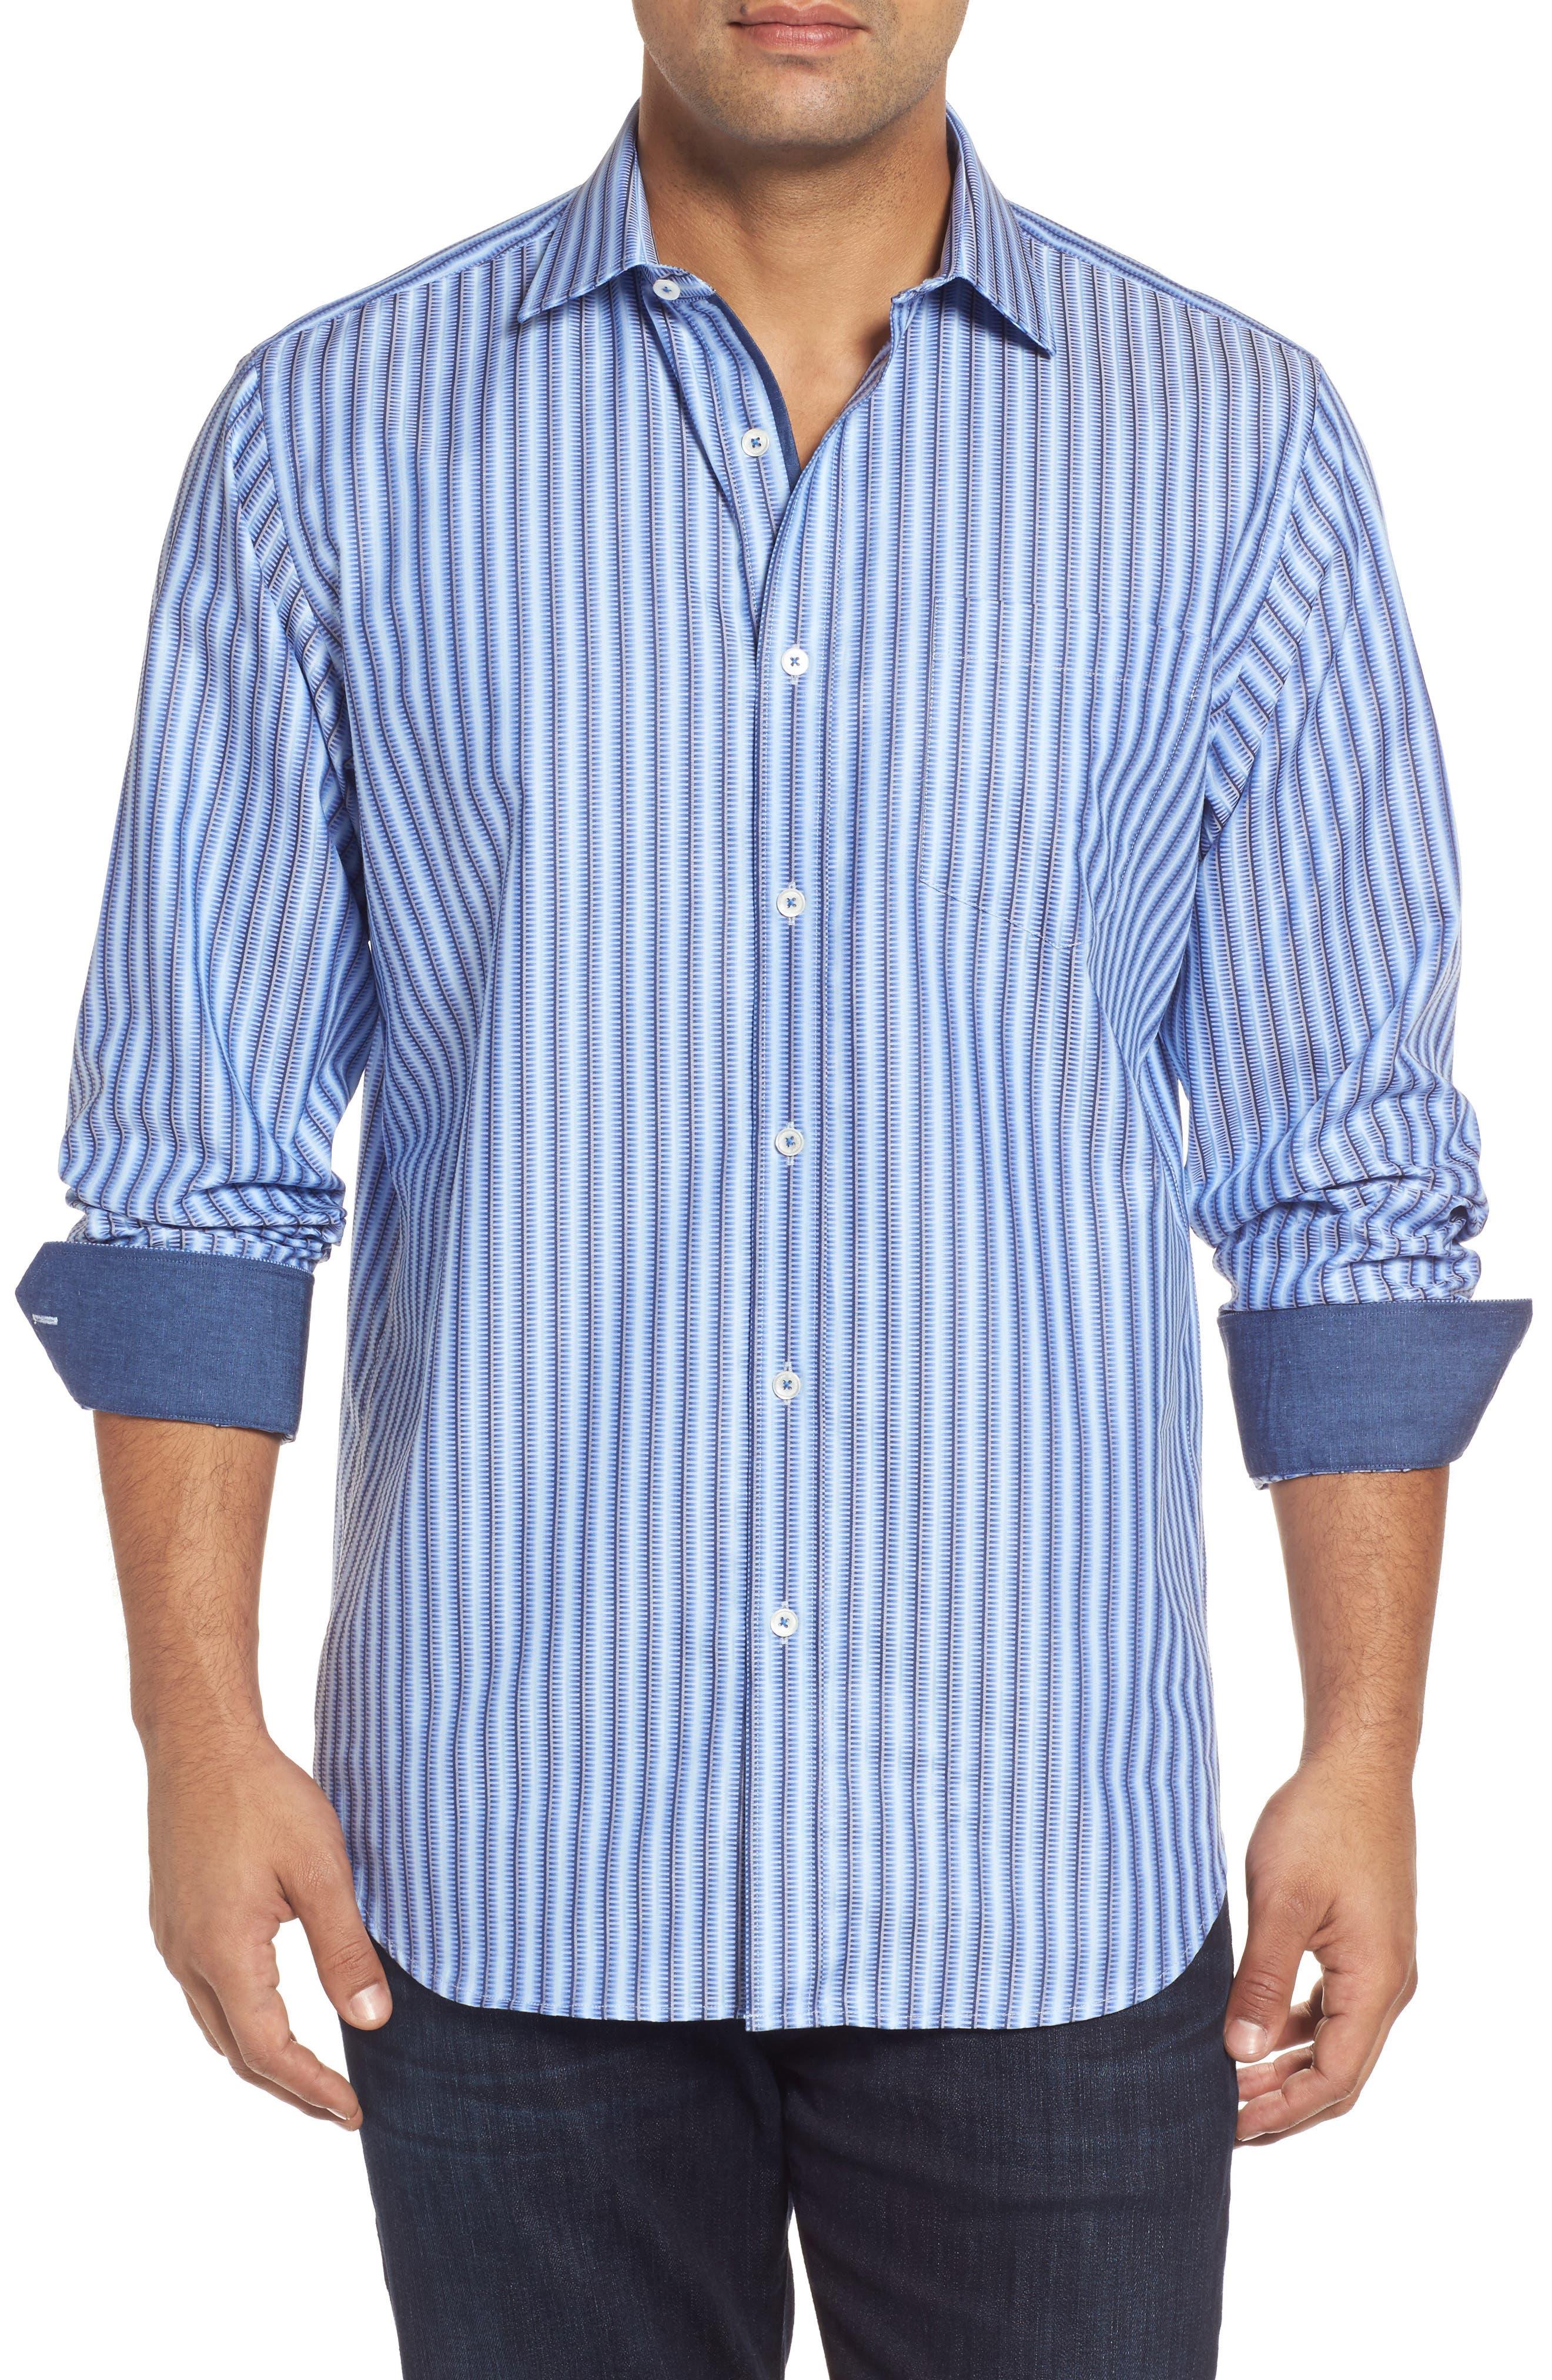 Main Image - Bugatchi Classic Fit Striped Sport Shirt